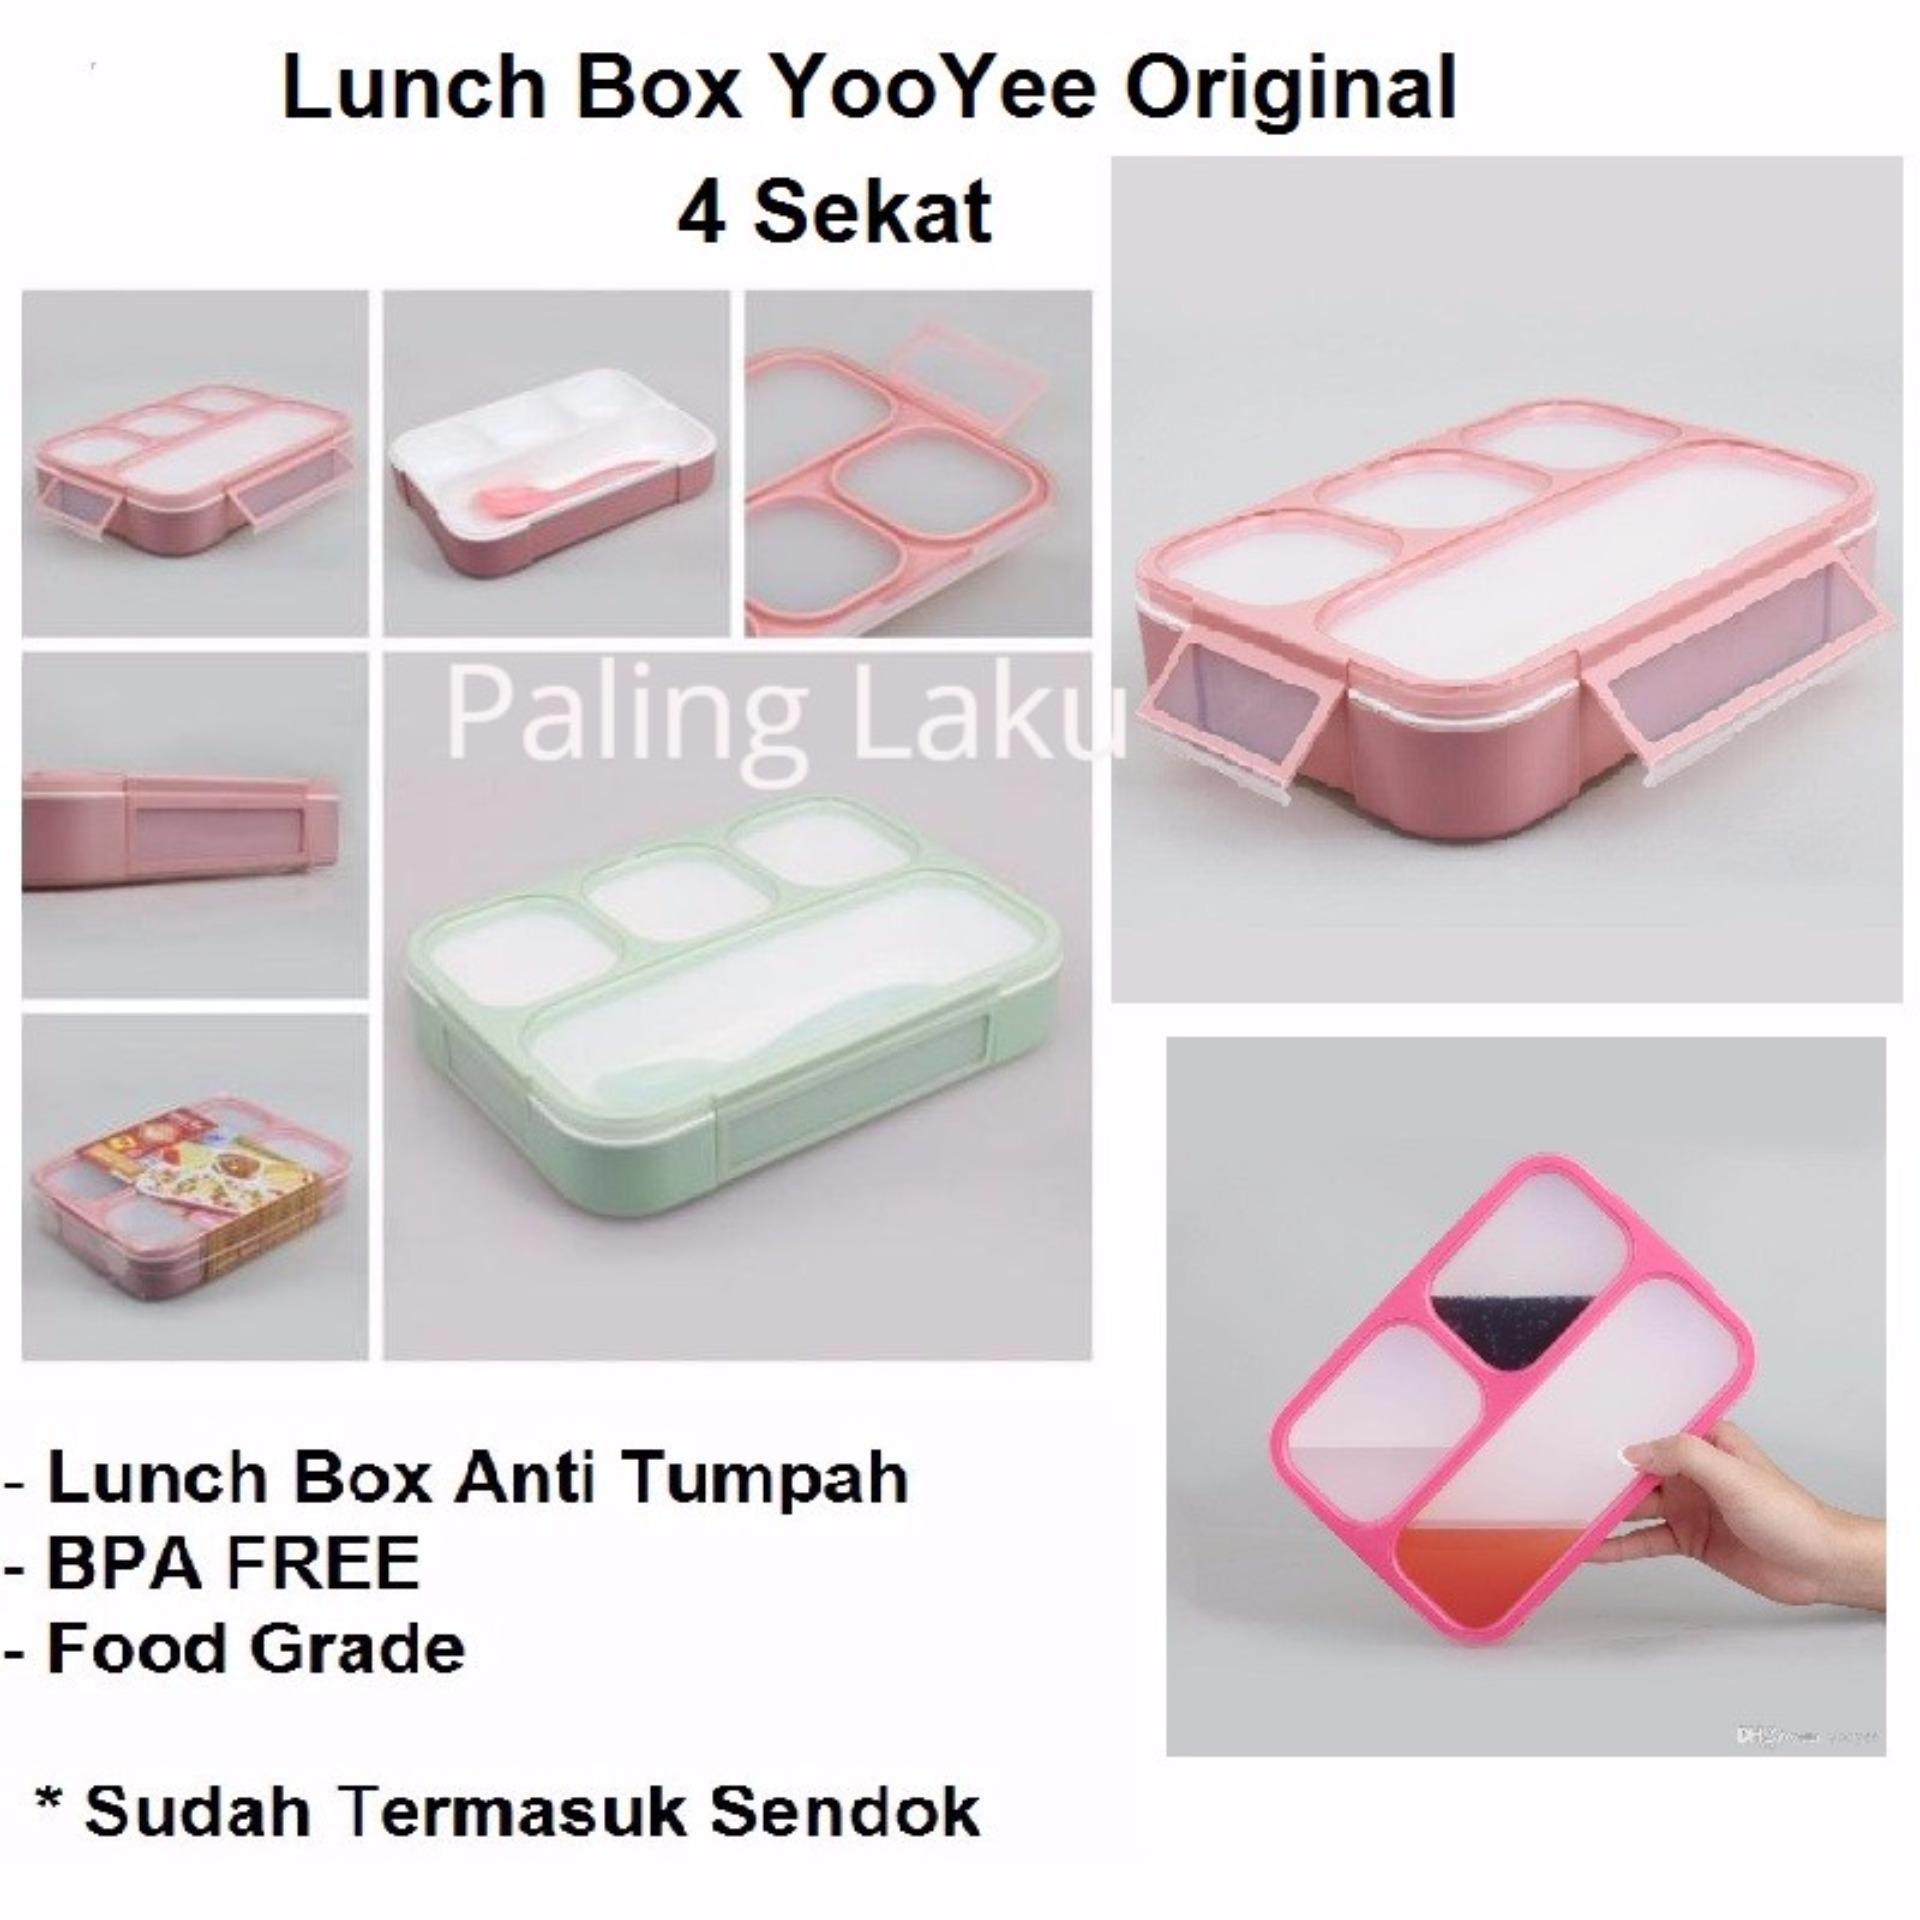 Lunch Box Yoyee Kotak makan yooyee grid bento 4 sekat- 578